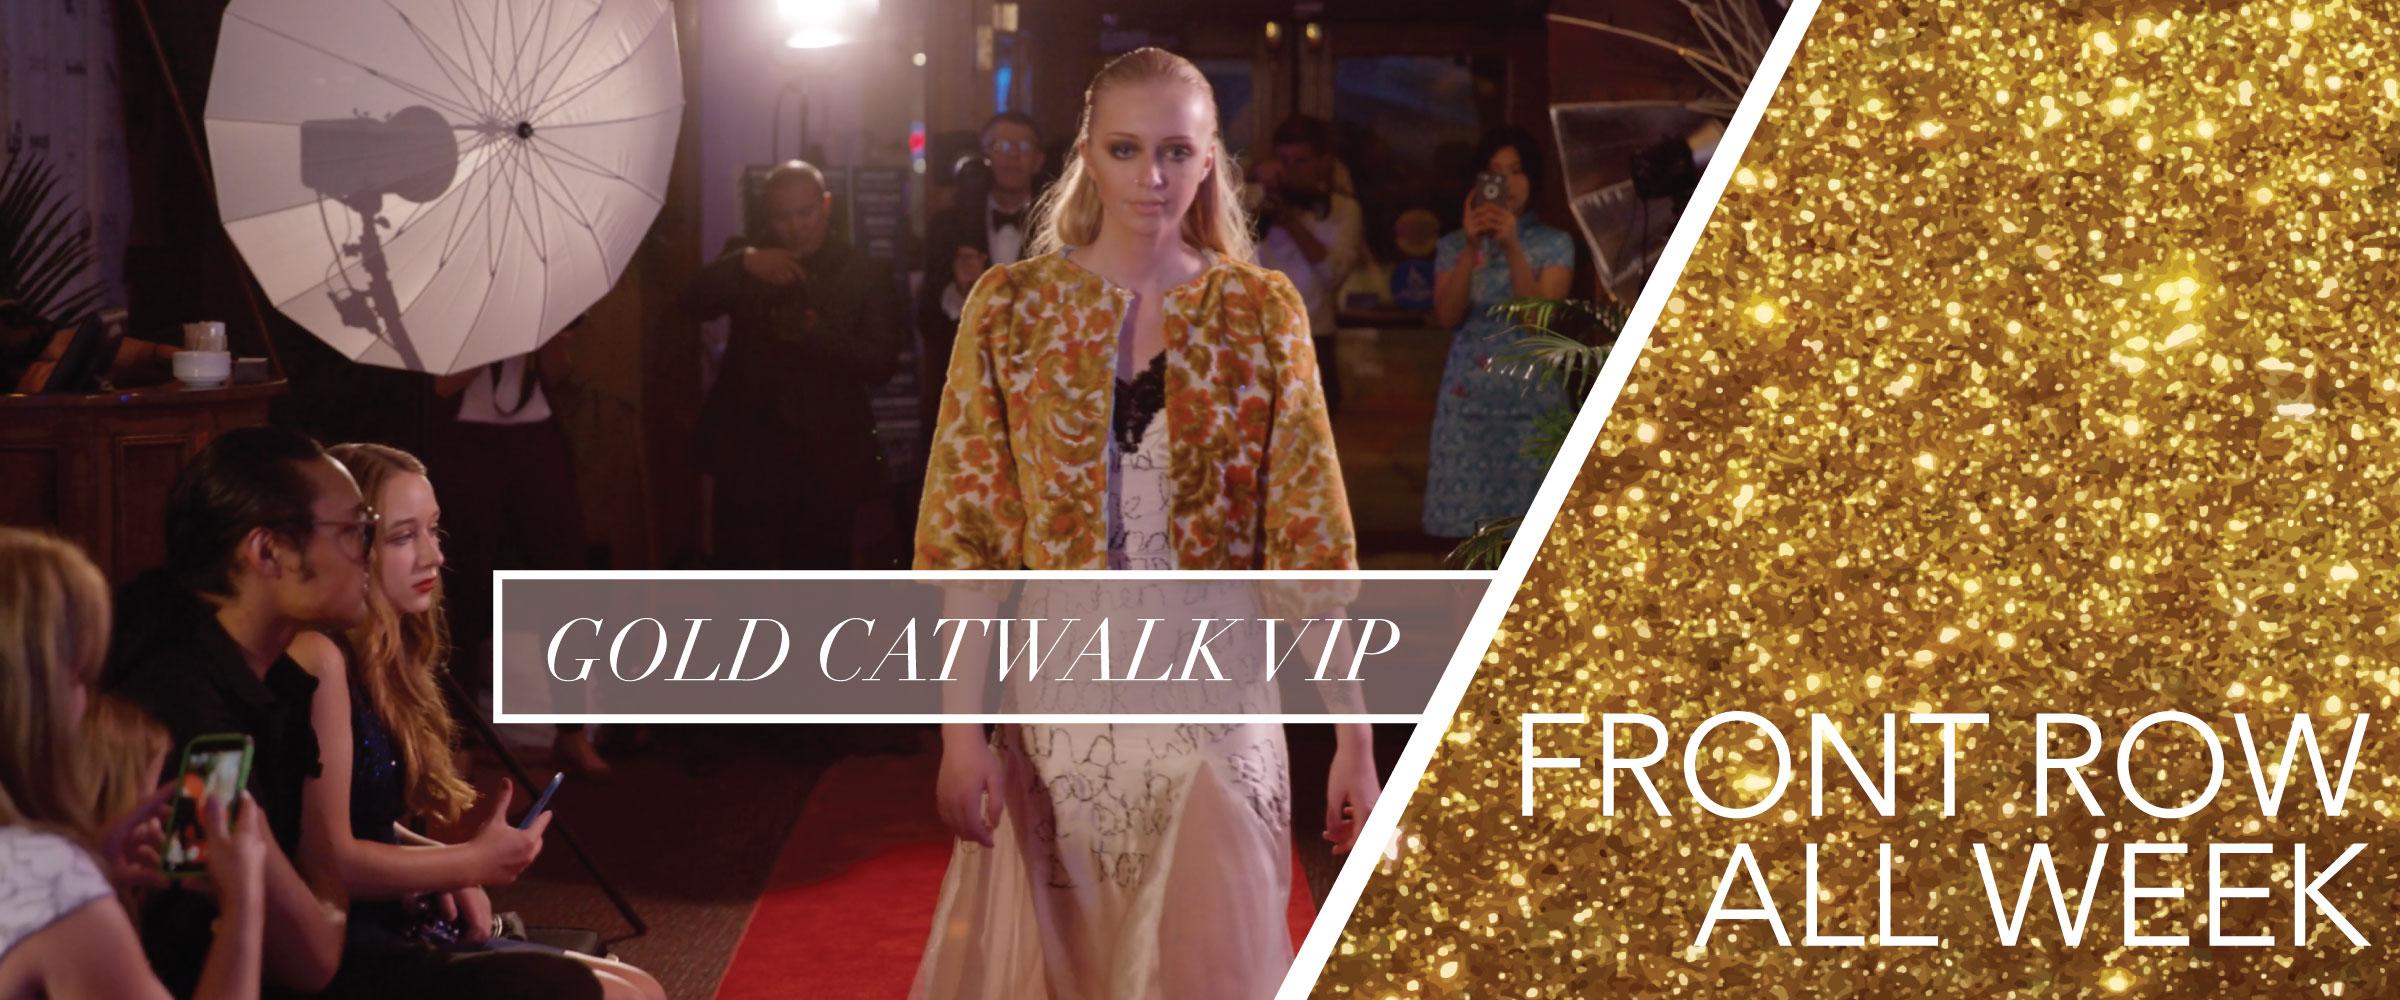 gold-catwalk.jpg